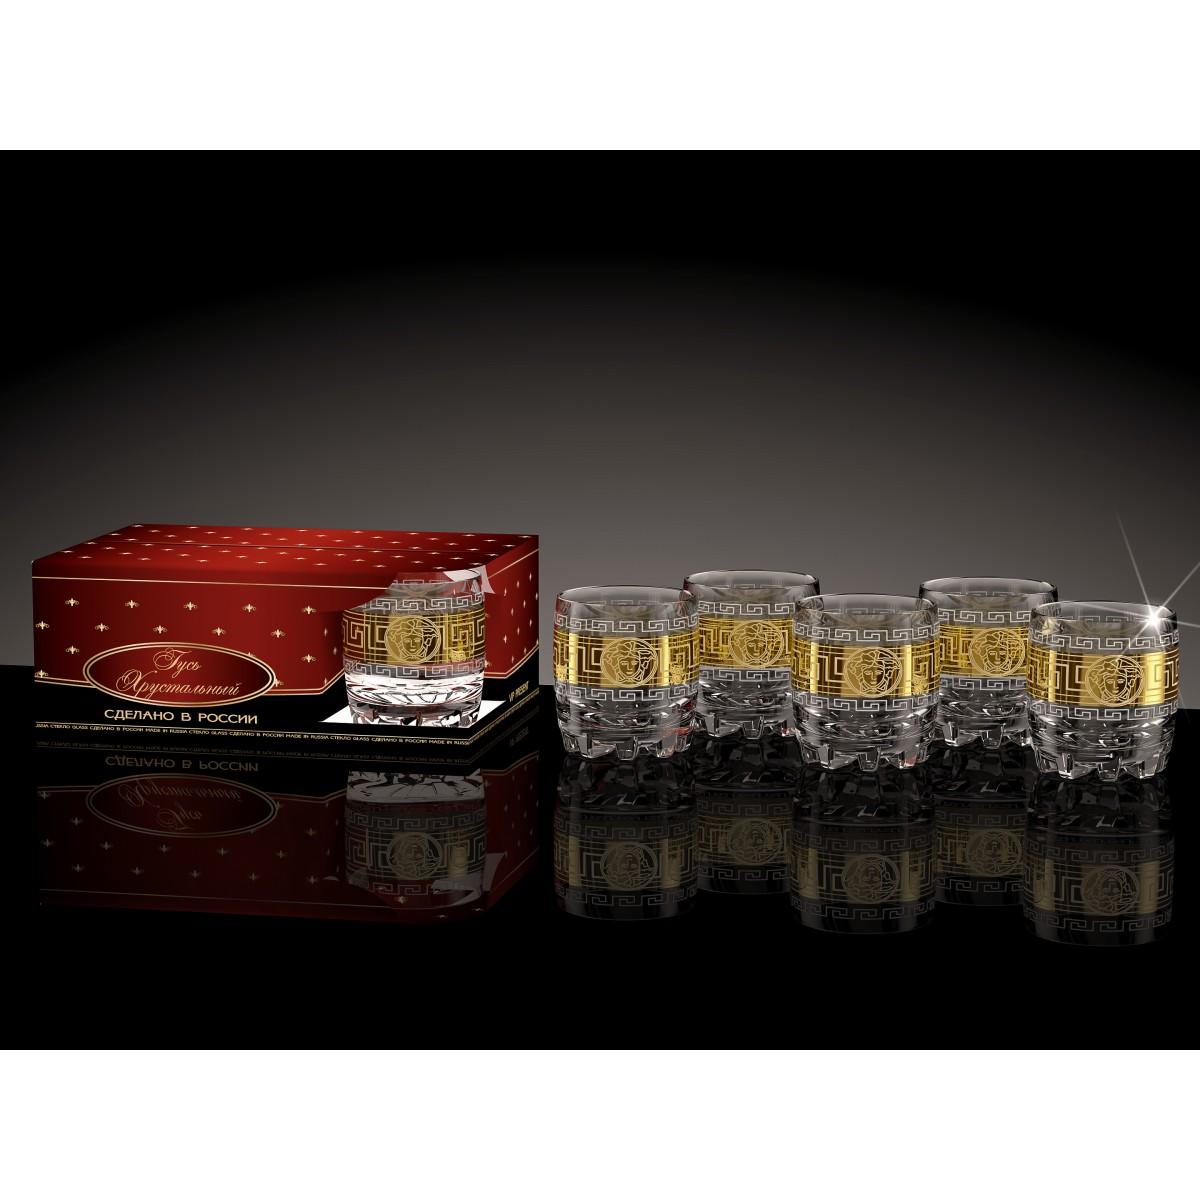 GN3_415_3 Набор из 6 стаканов «Версаль», 315 мл